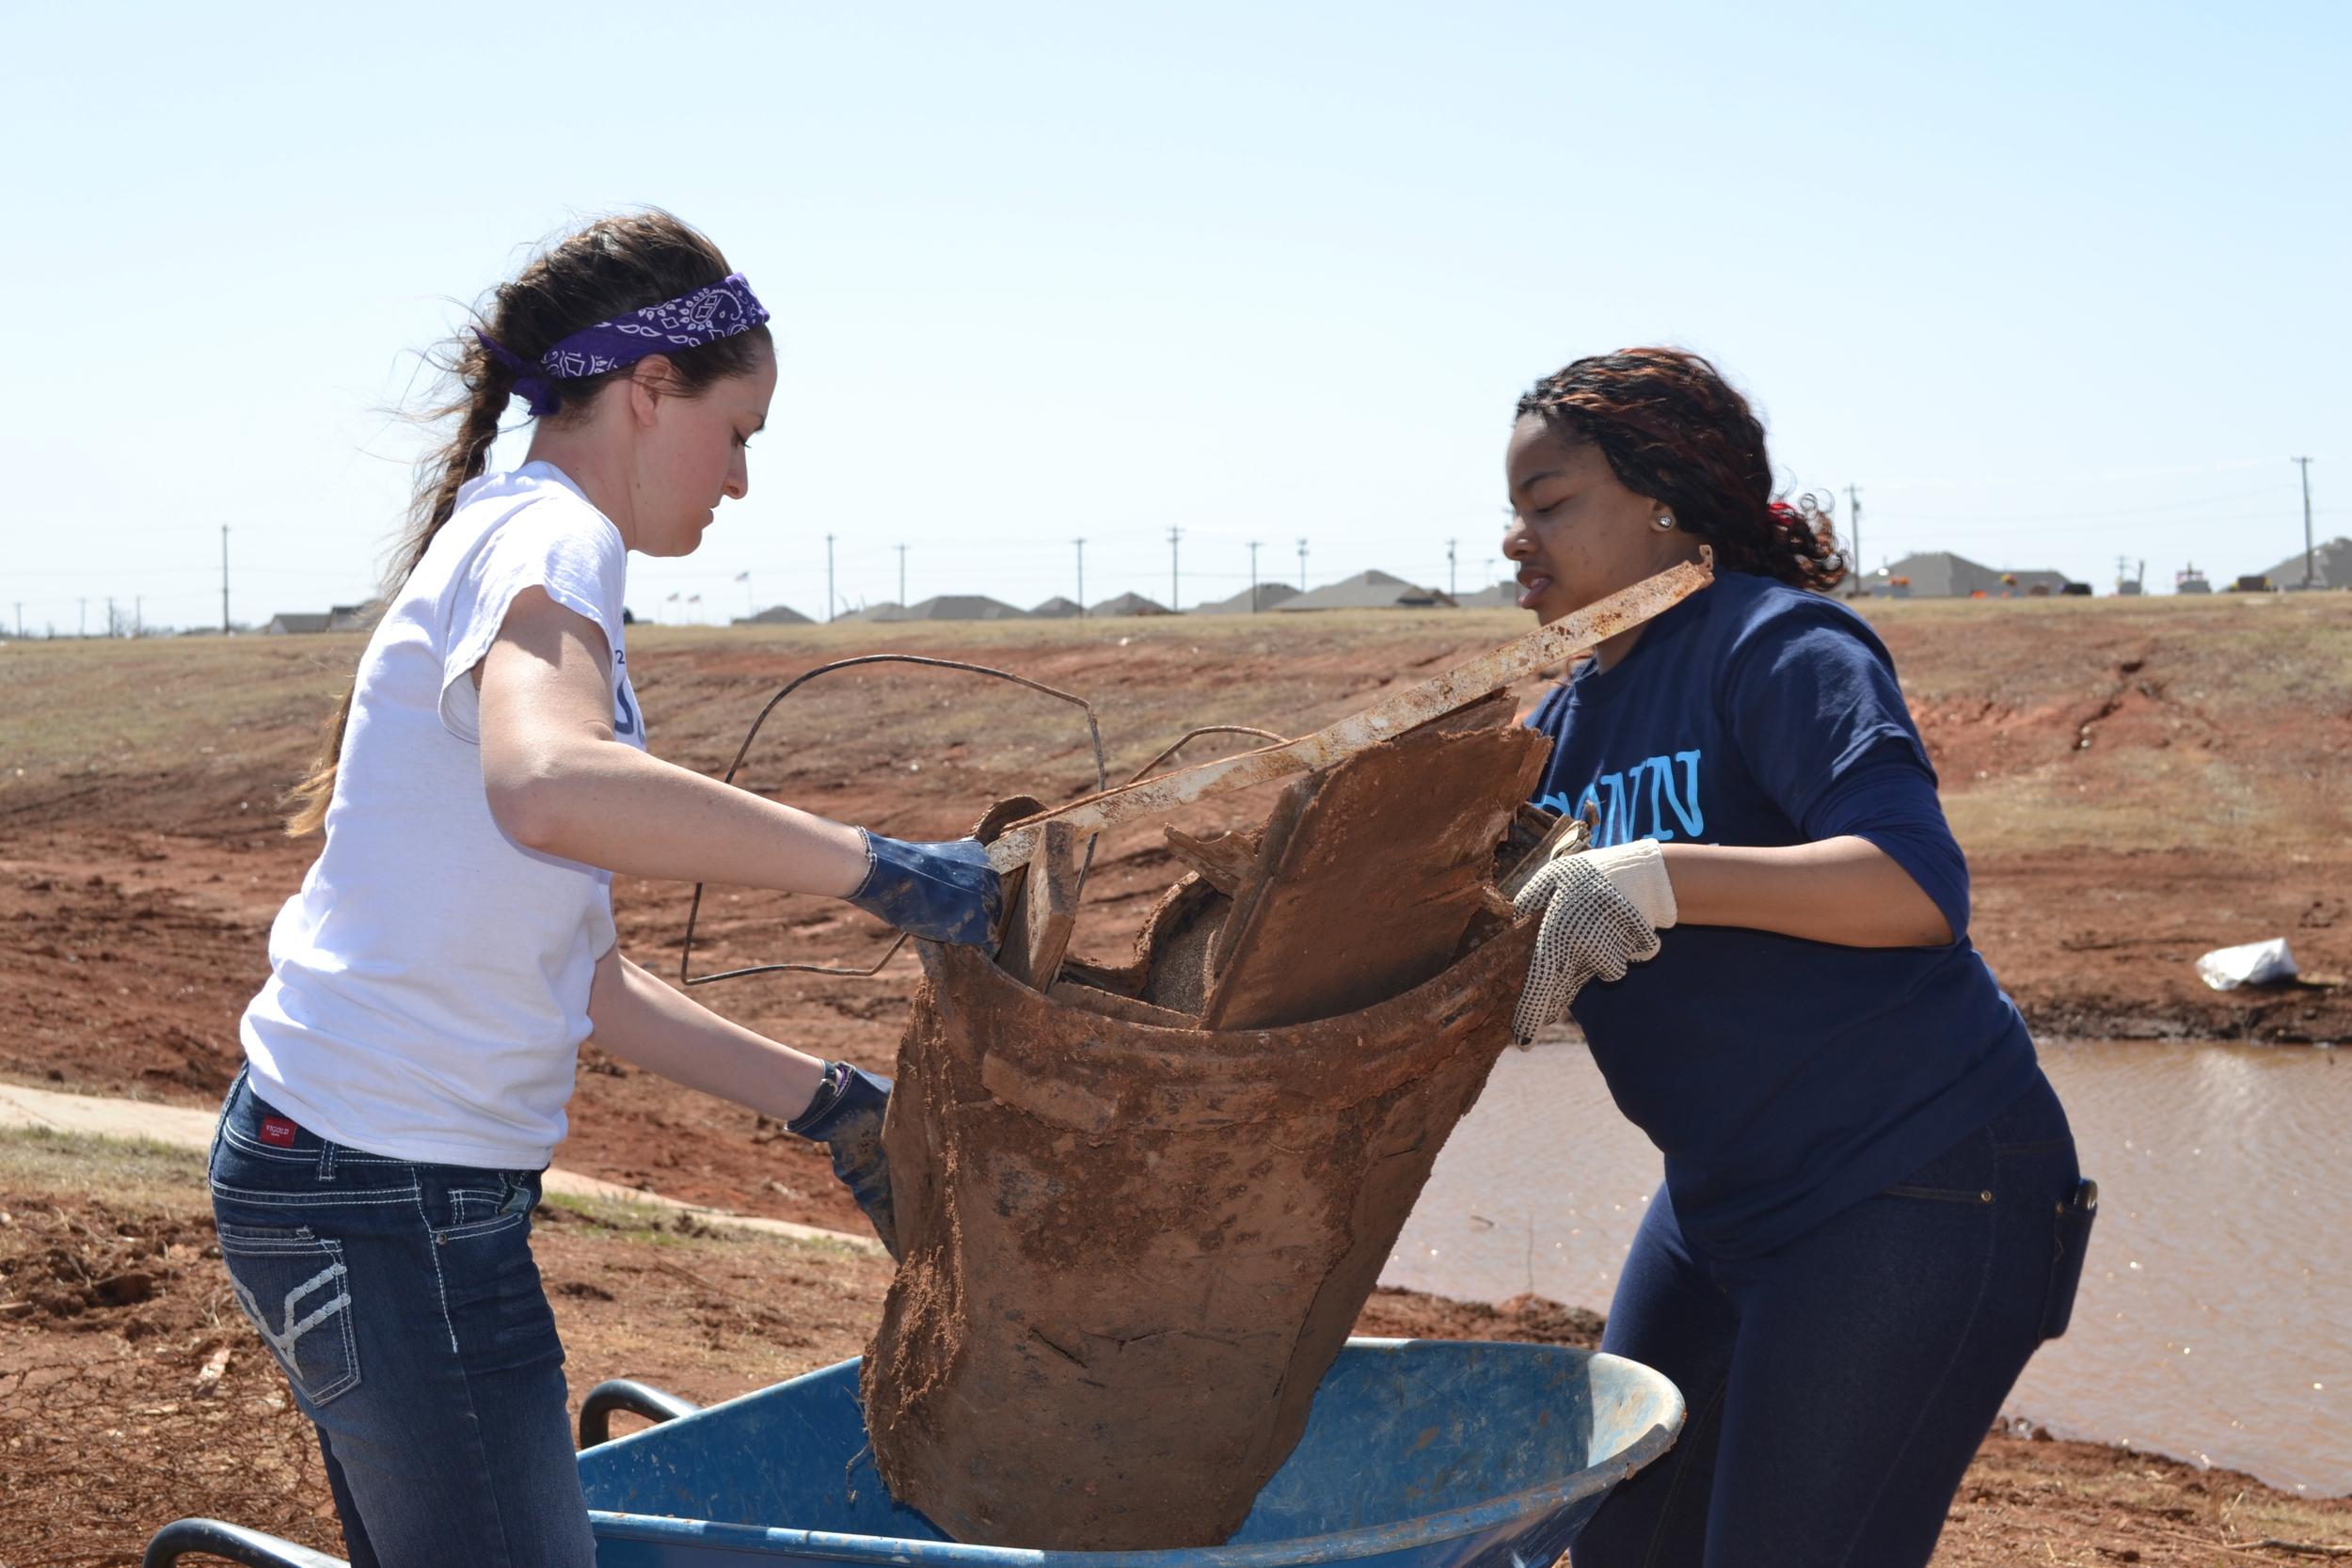 CT volunteers Little River 3.18.14-10.JPG